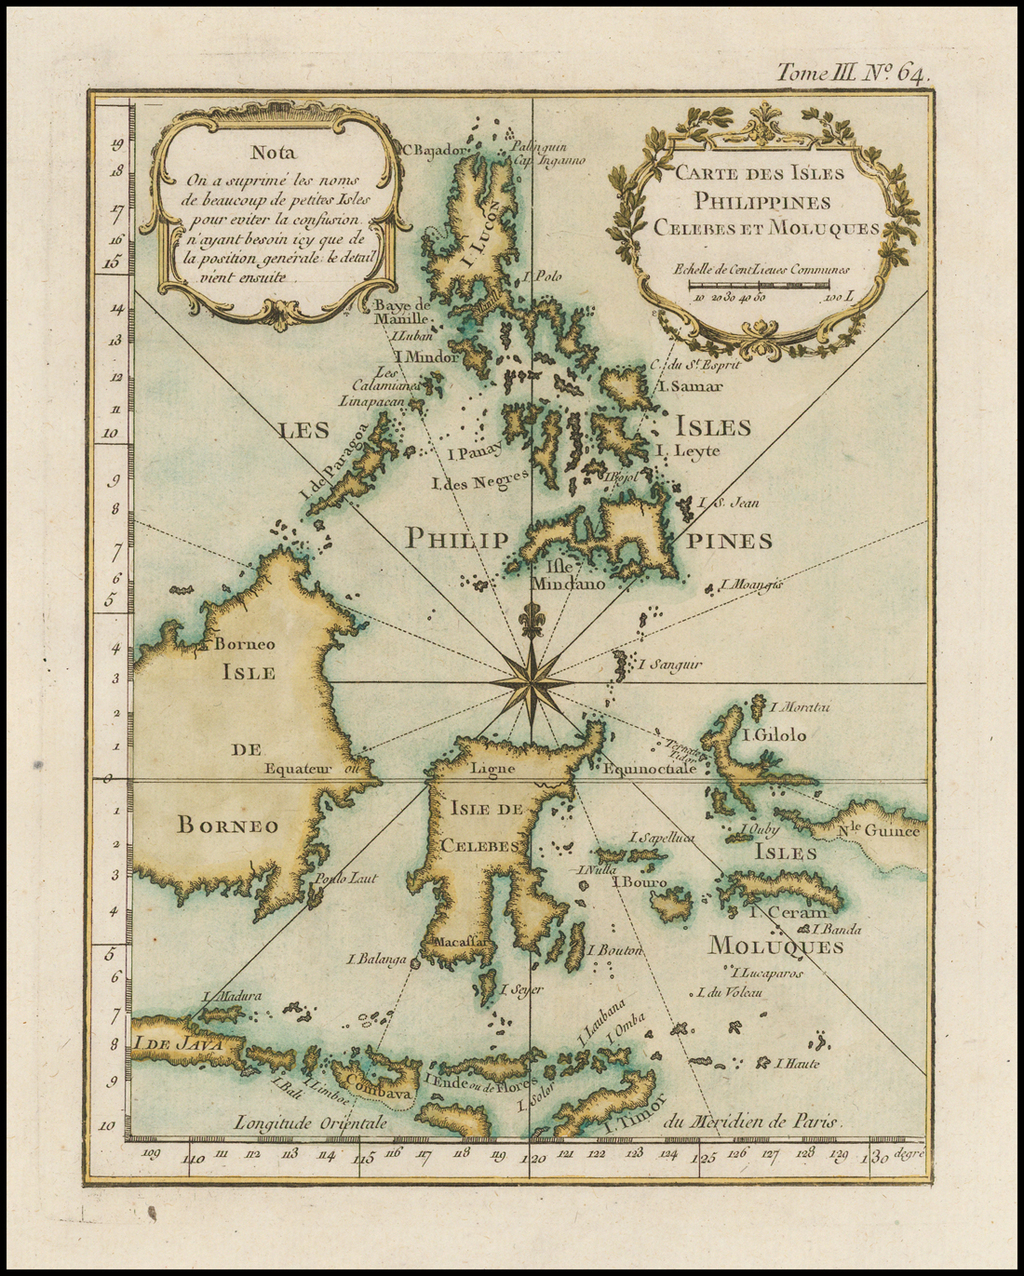 Carte Des Isles Philippines Celebes et Moluques By Jacques Nicolas Bellin